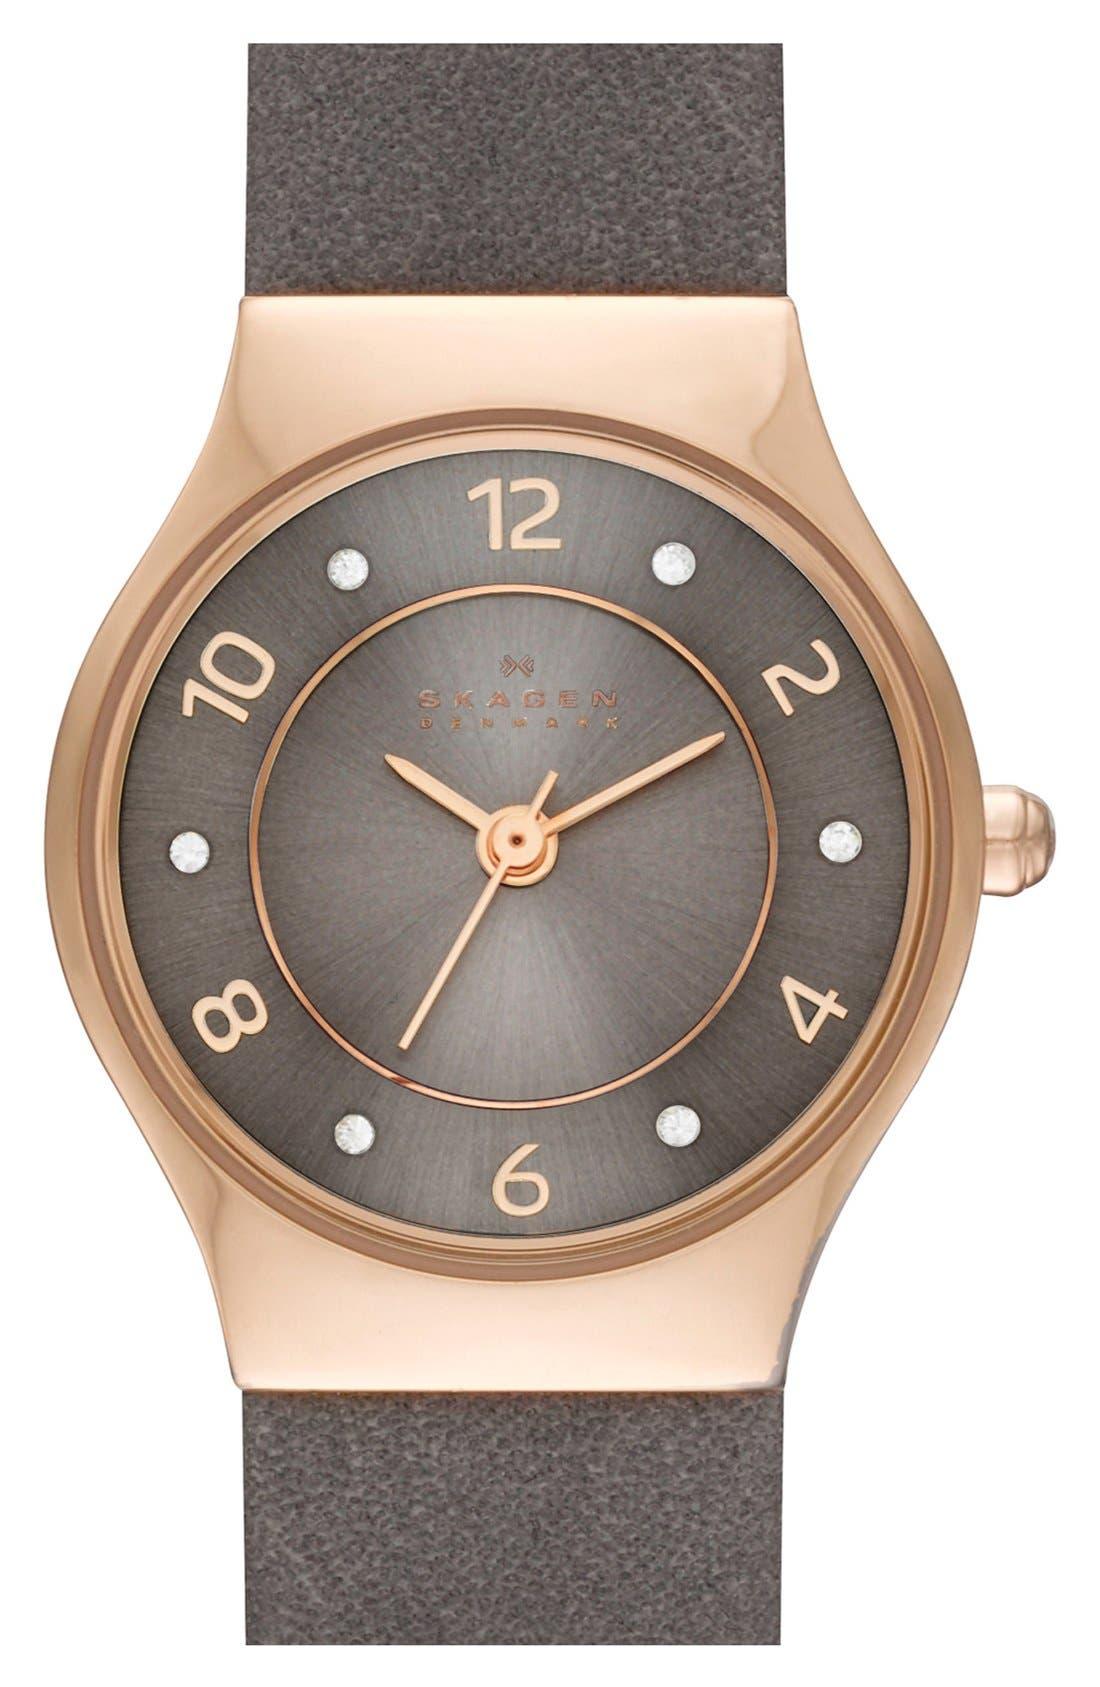 Main Image - Skagen 'Grenen' Crystal Marker Leather Strap Watch, 24mm